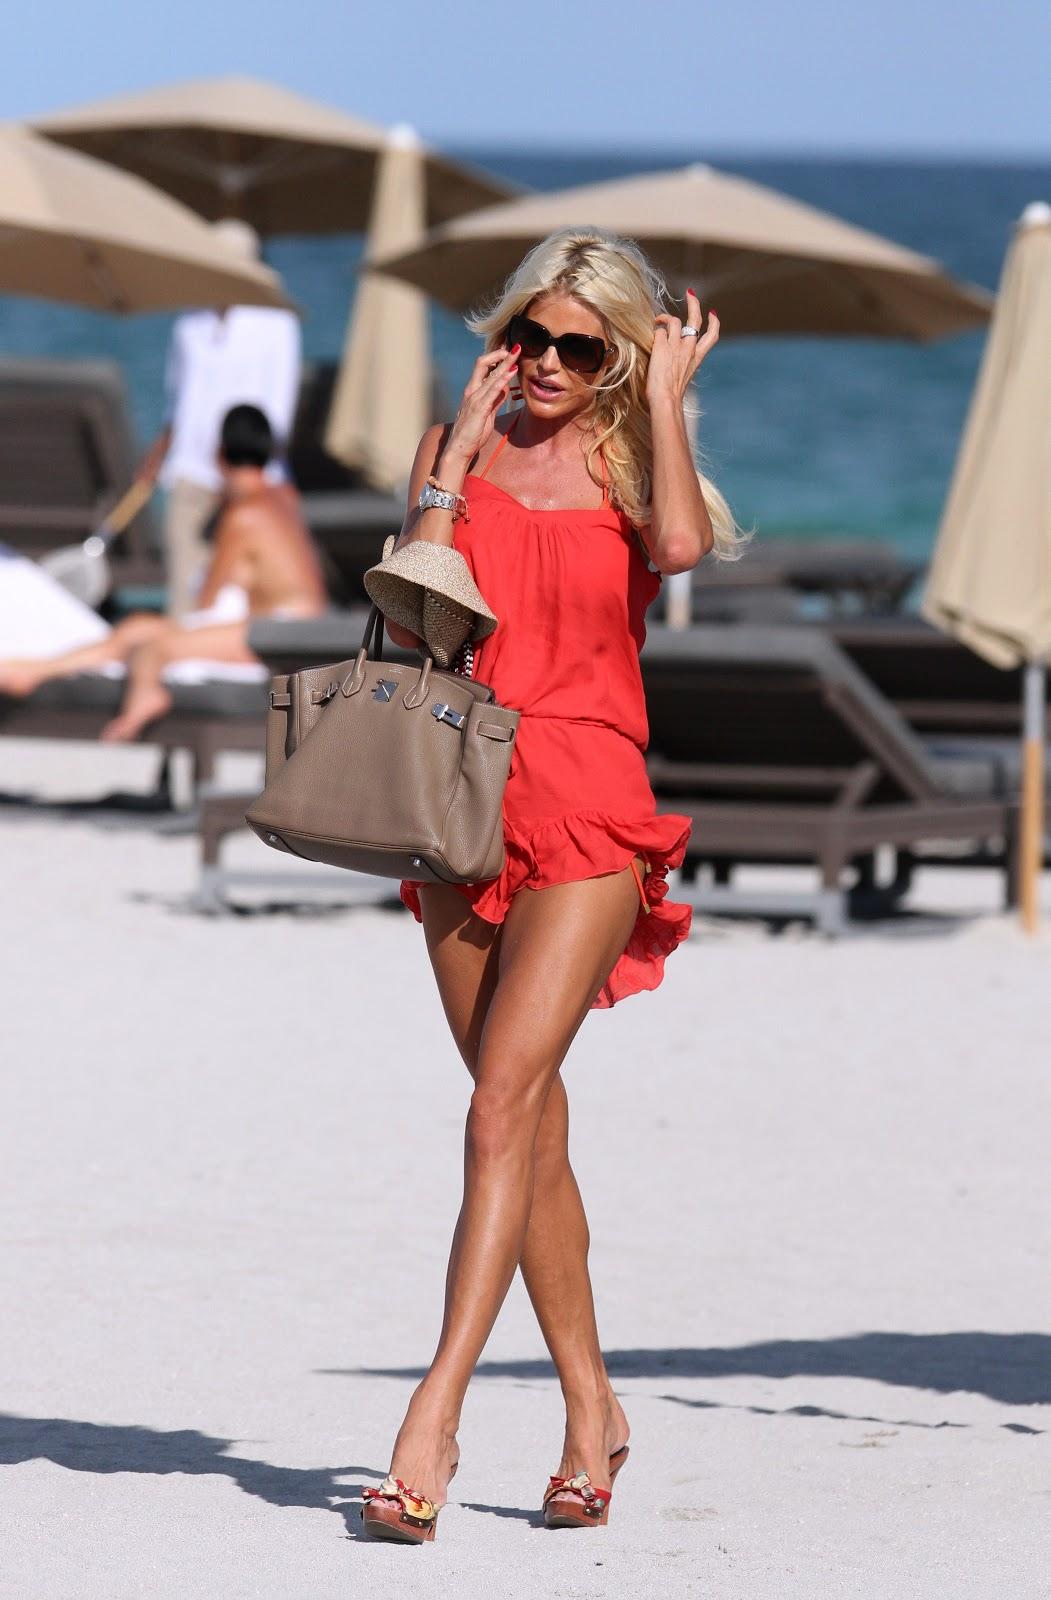 http://4.bp.blogspot.com/-QLpMGfA8P90/UIFU9FCy1aI/AAAAAAAAUa4/Nh_AcRzaCUE/s1600/Victoria+Silvstedt+in+an+orange+bikini+on+the+beach+in+Miami+October+18th+2012.jpg